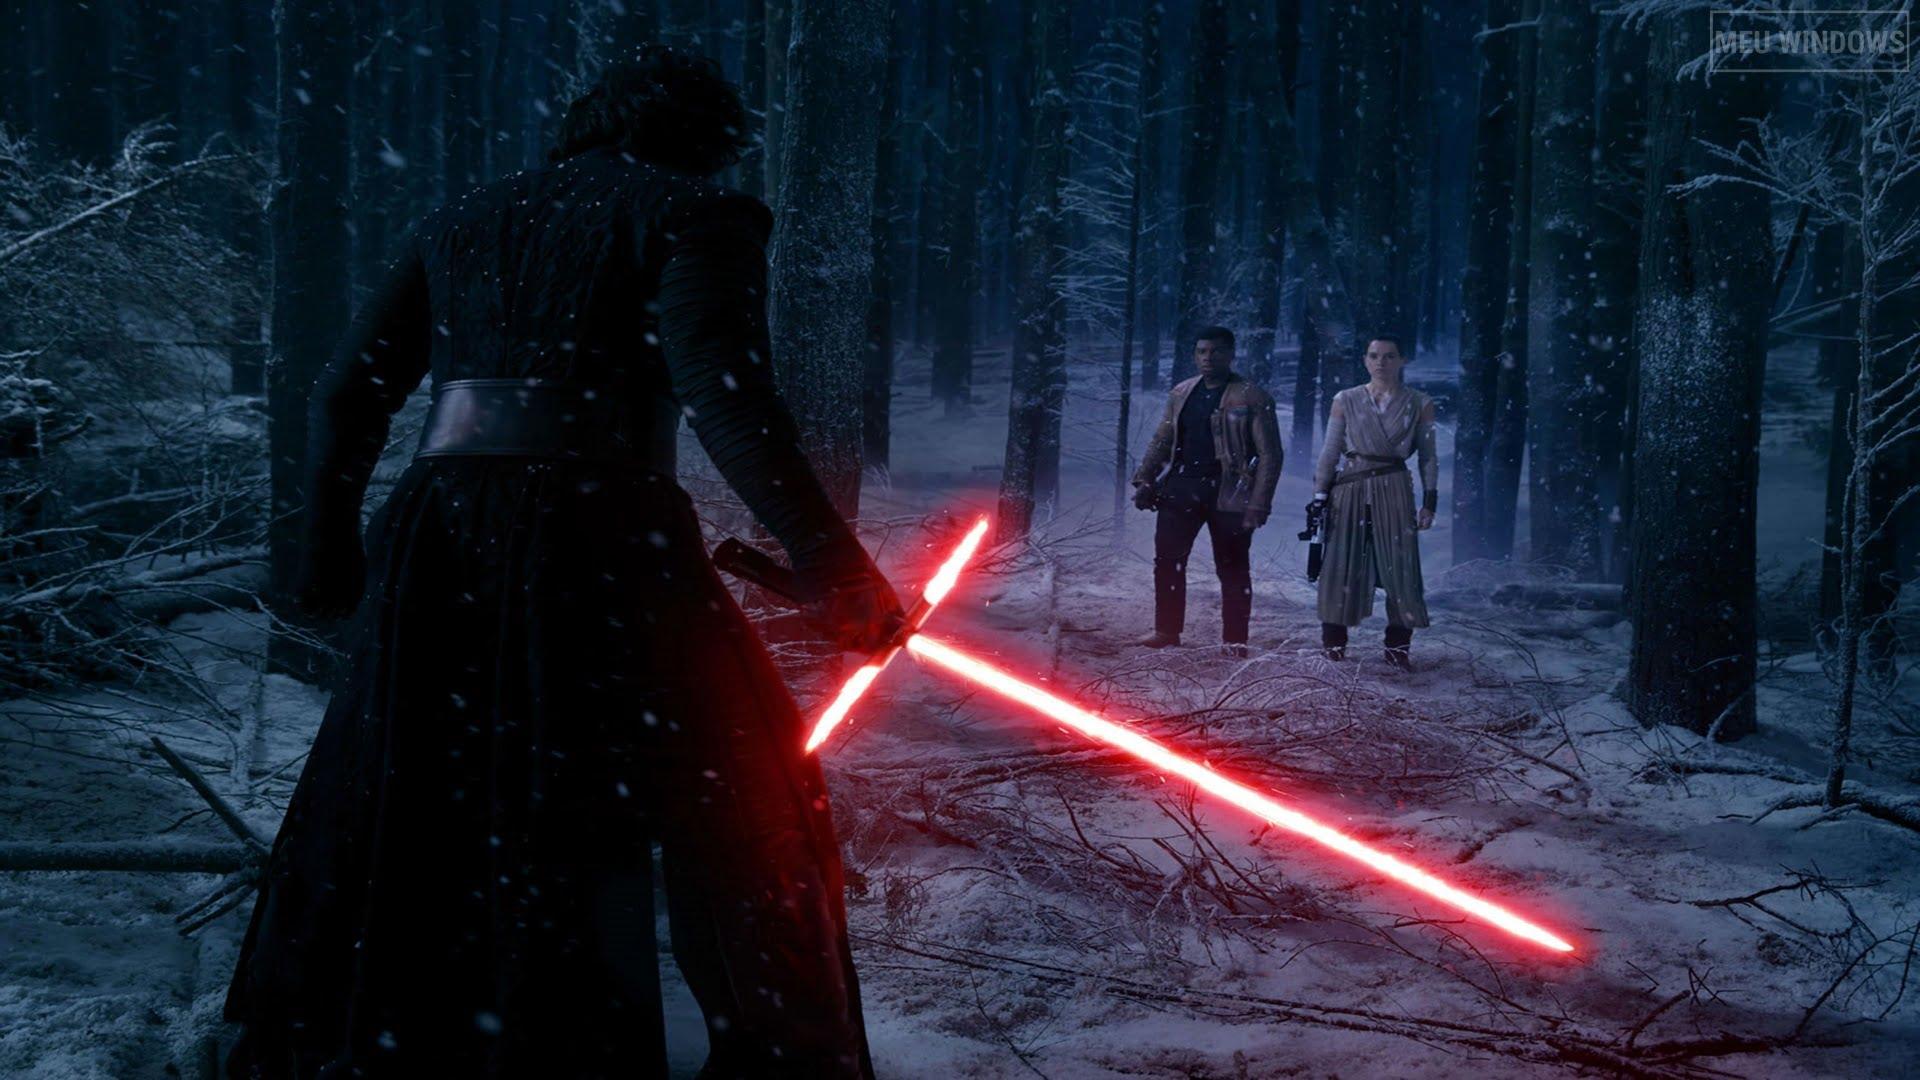 Star Wars - O Despertar da Força Wallpaper 02